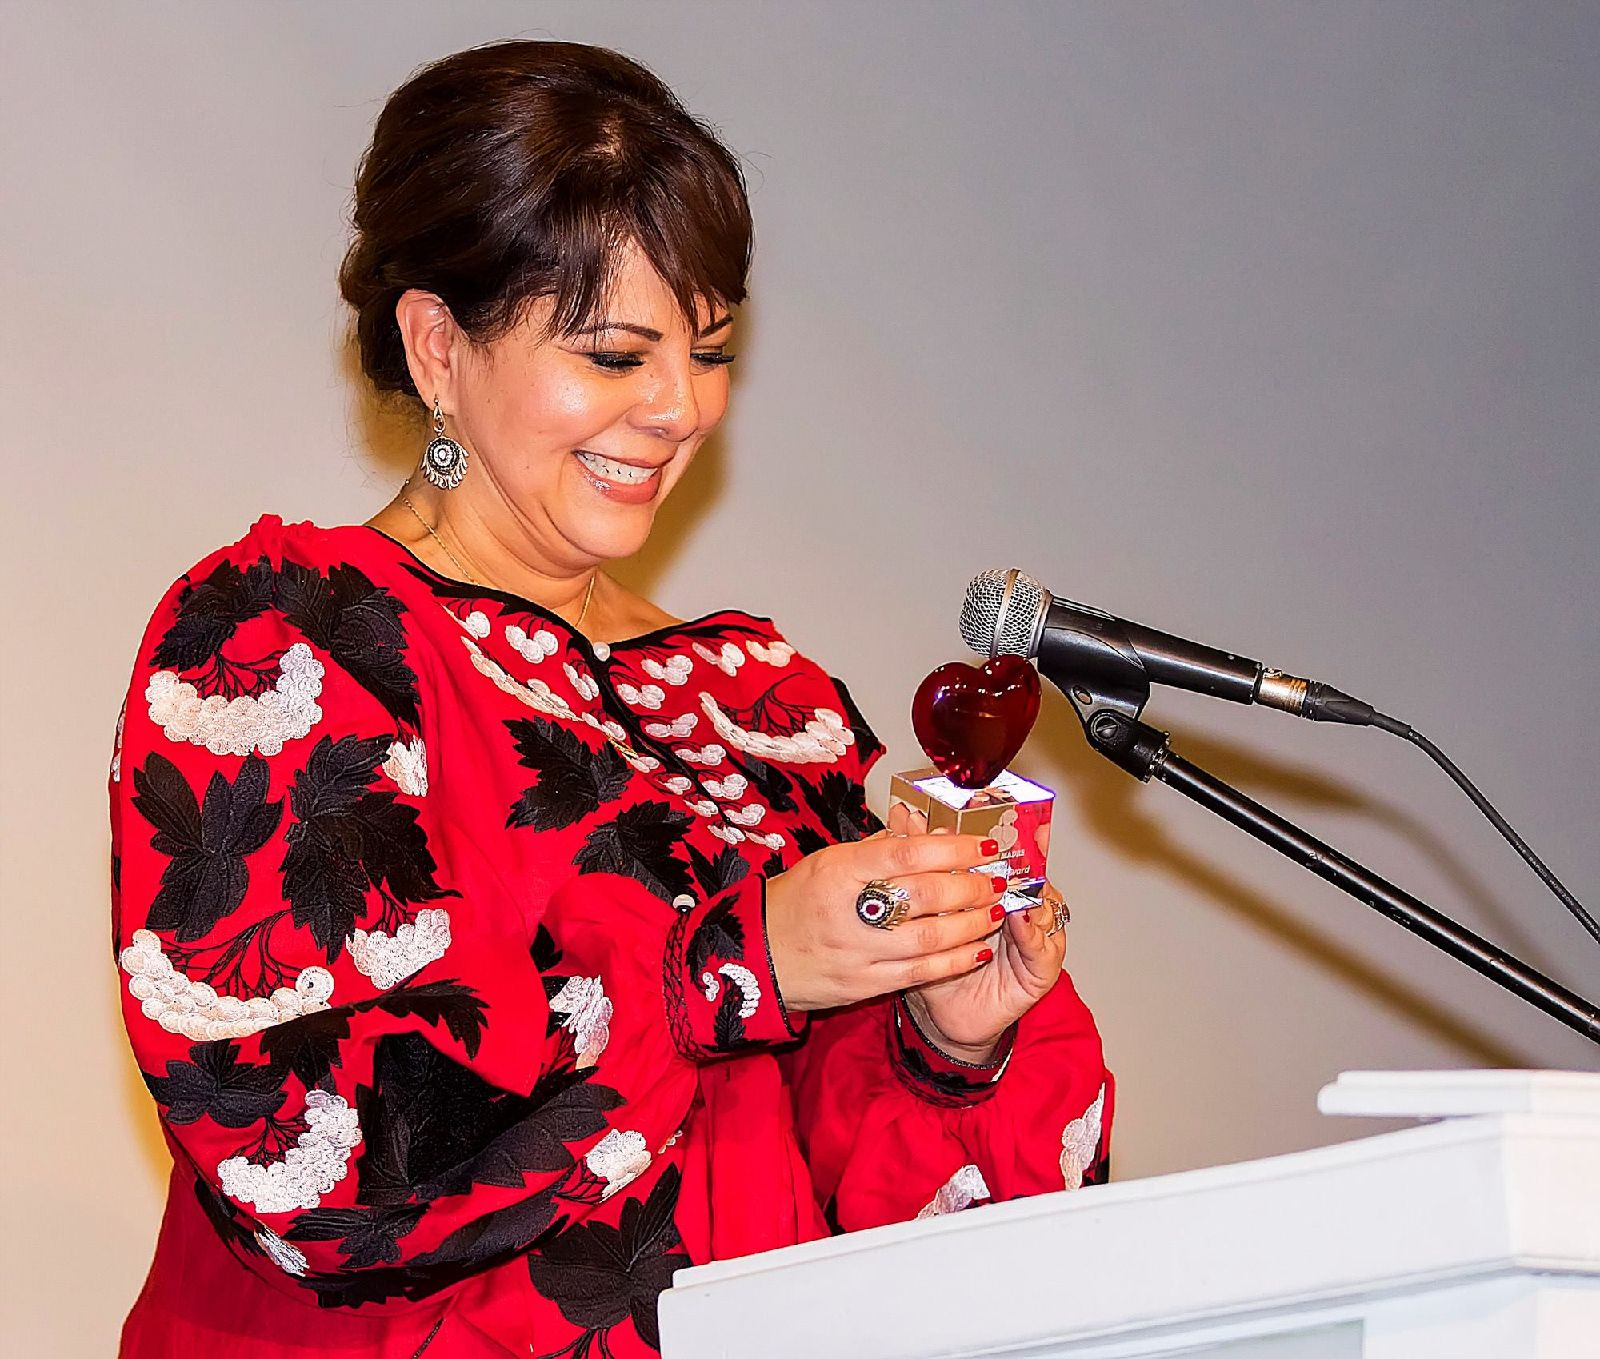 2017 Corazón Award Honoree, Fayruz Benyousef